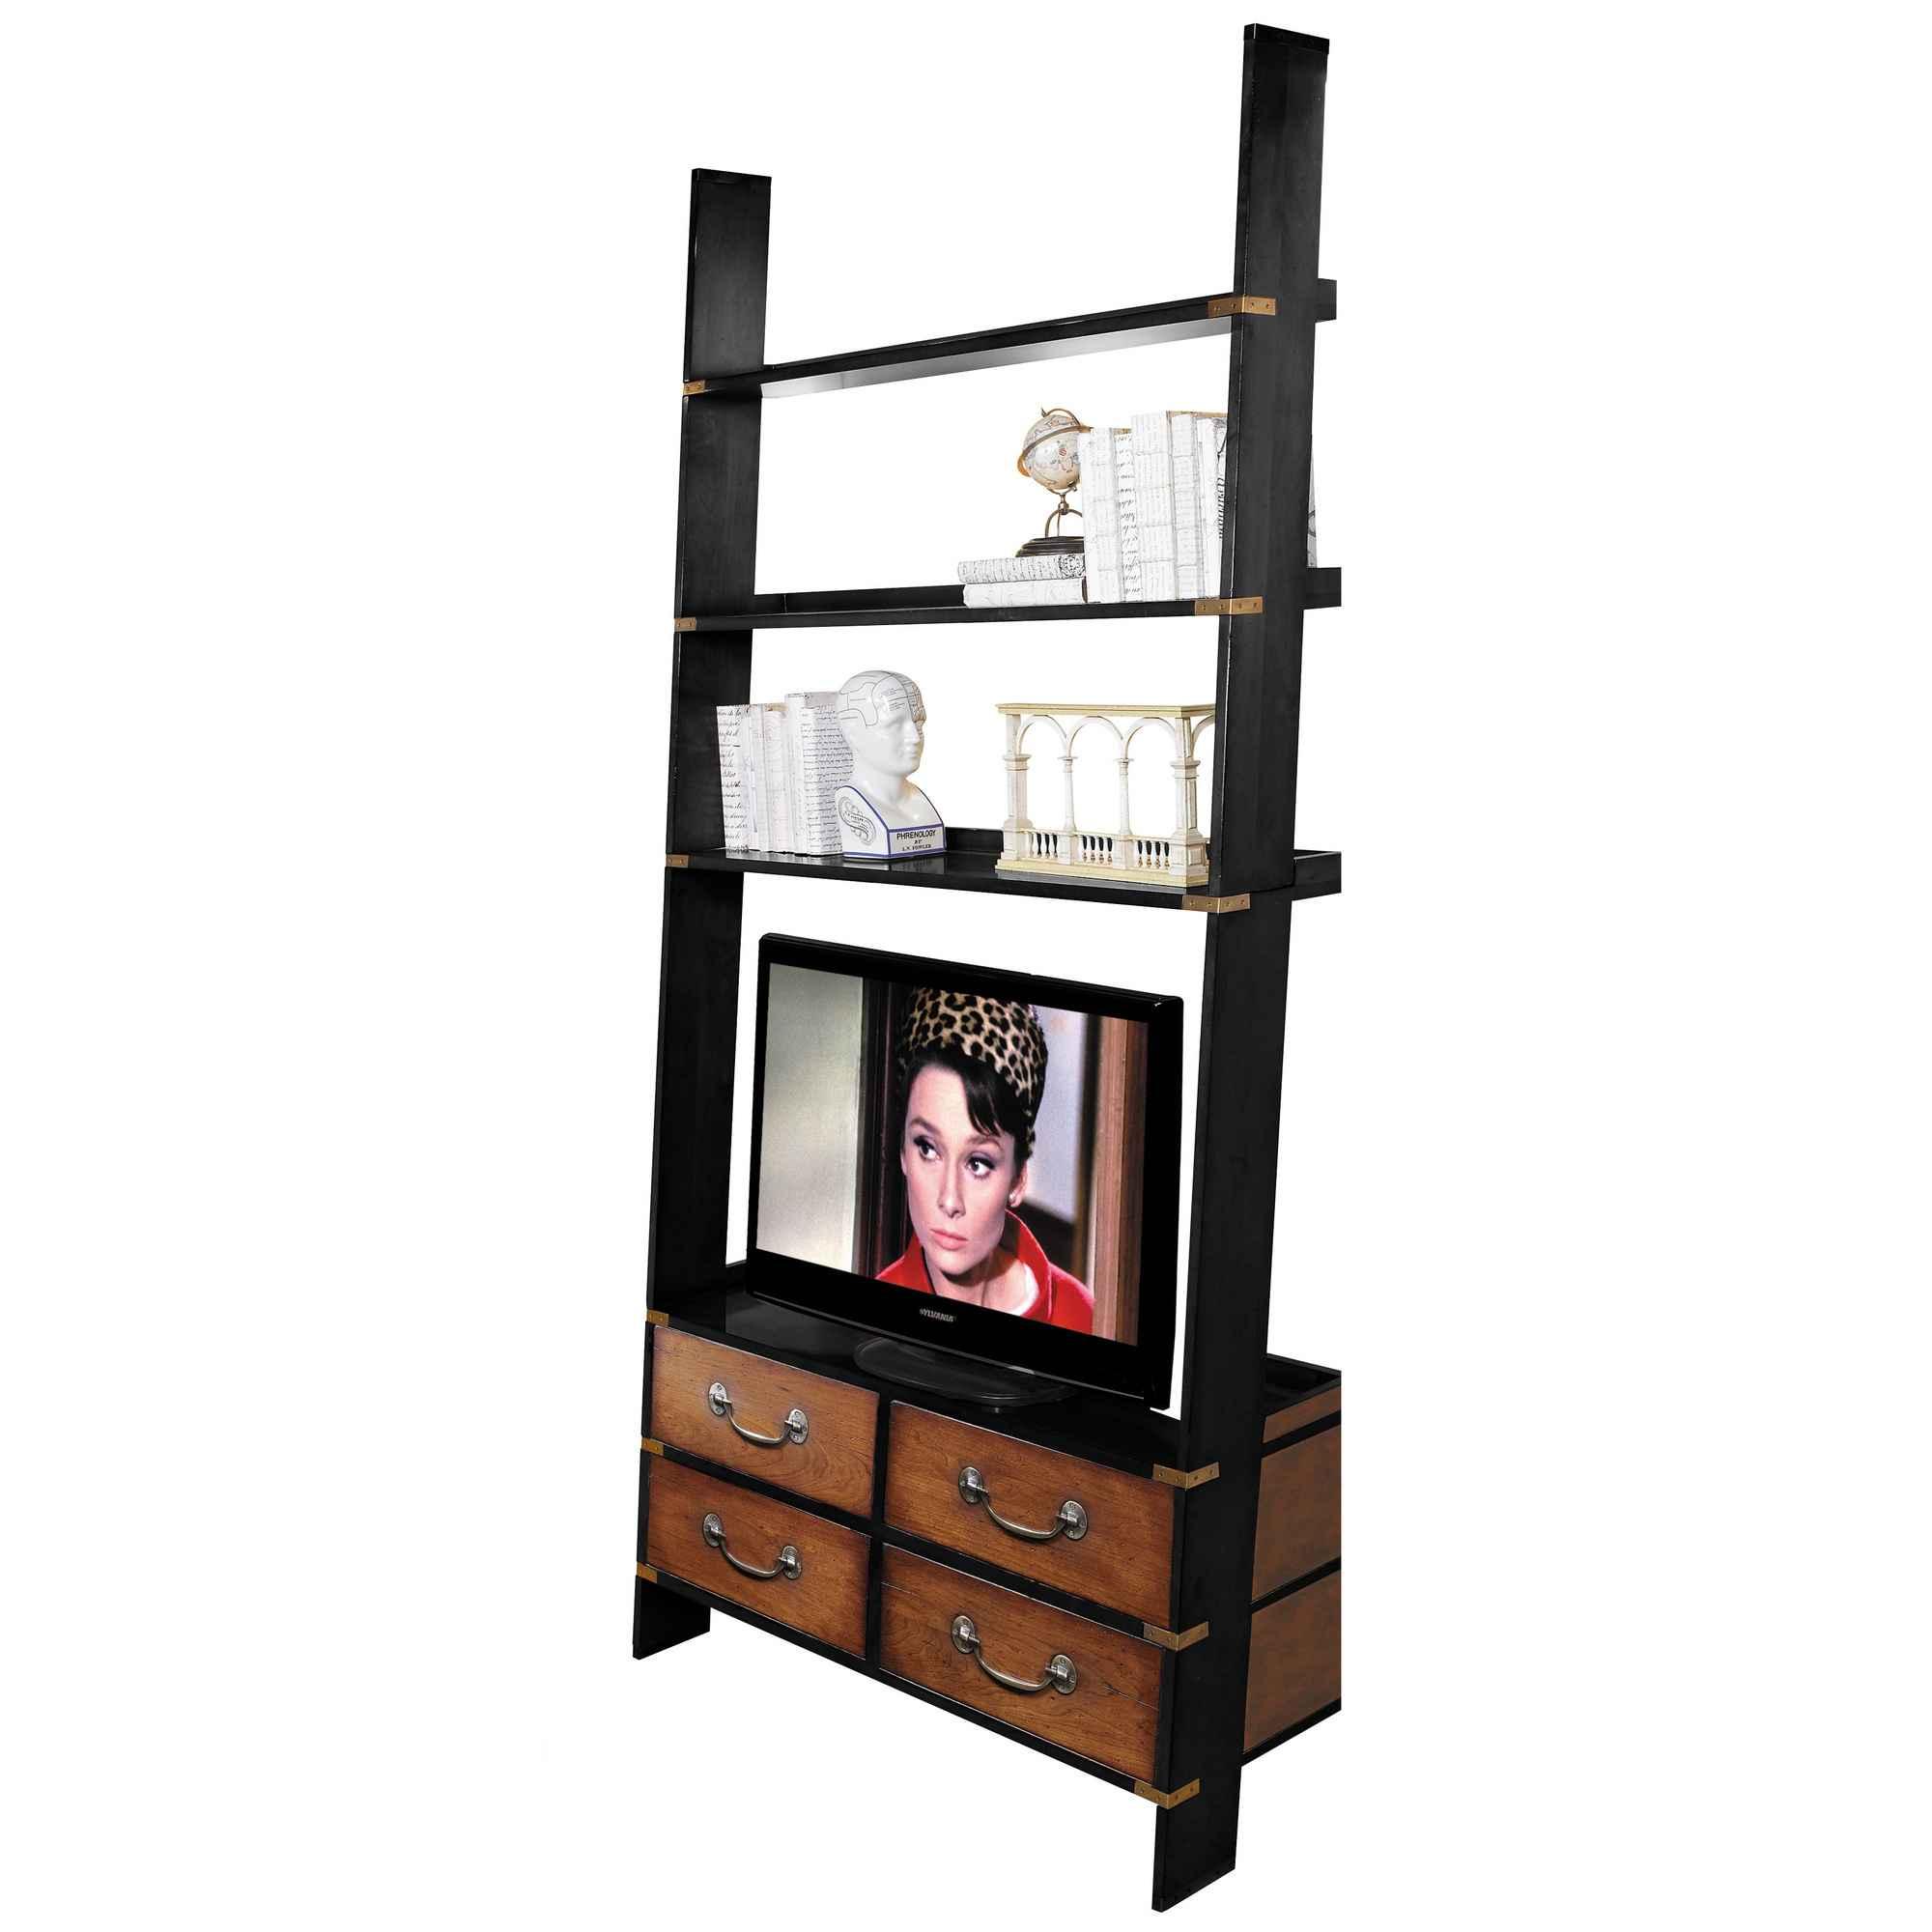 Wooden Ladder Bookshelf Plans, Free… – Amazing Wood Plans